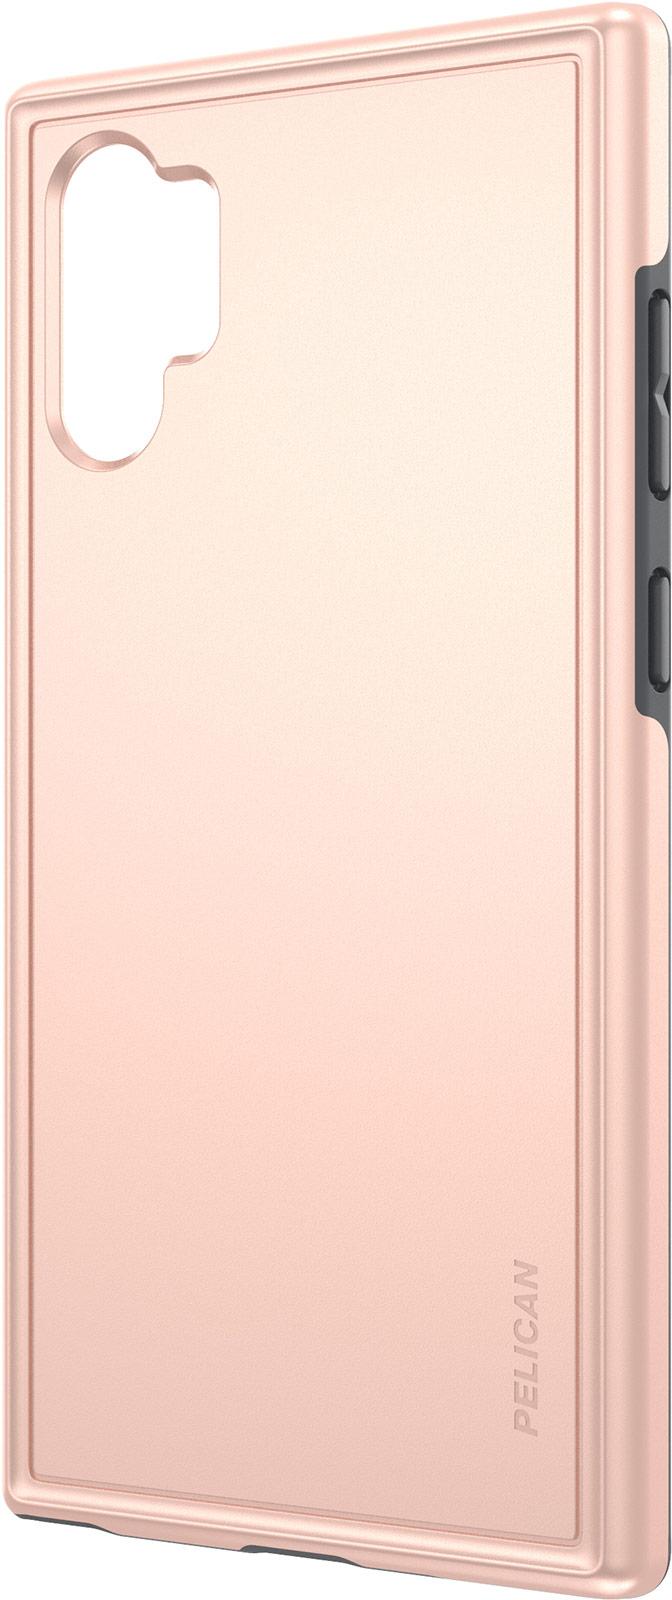 pelican galaxy note10 plus rose gold case